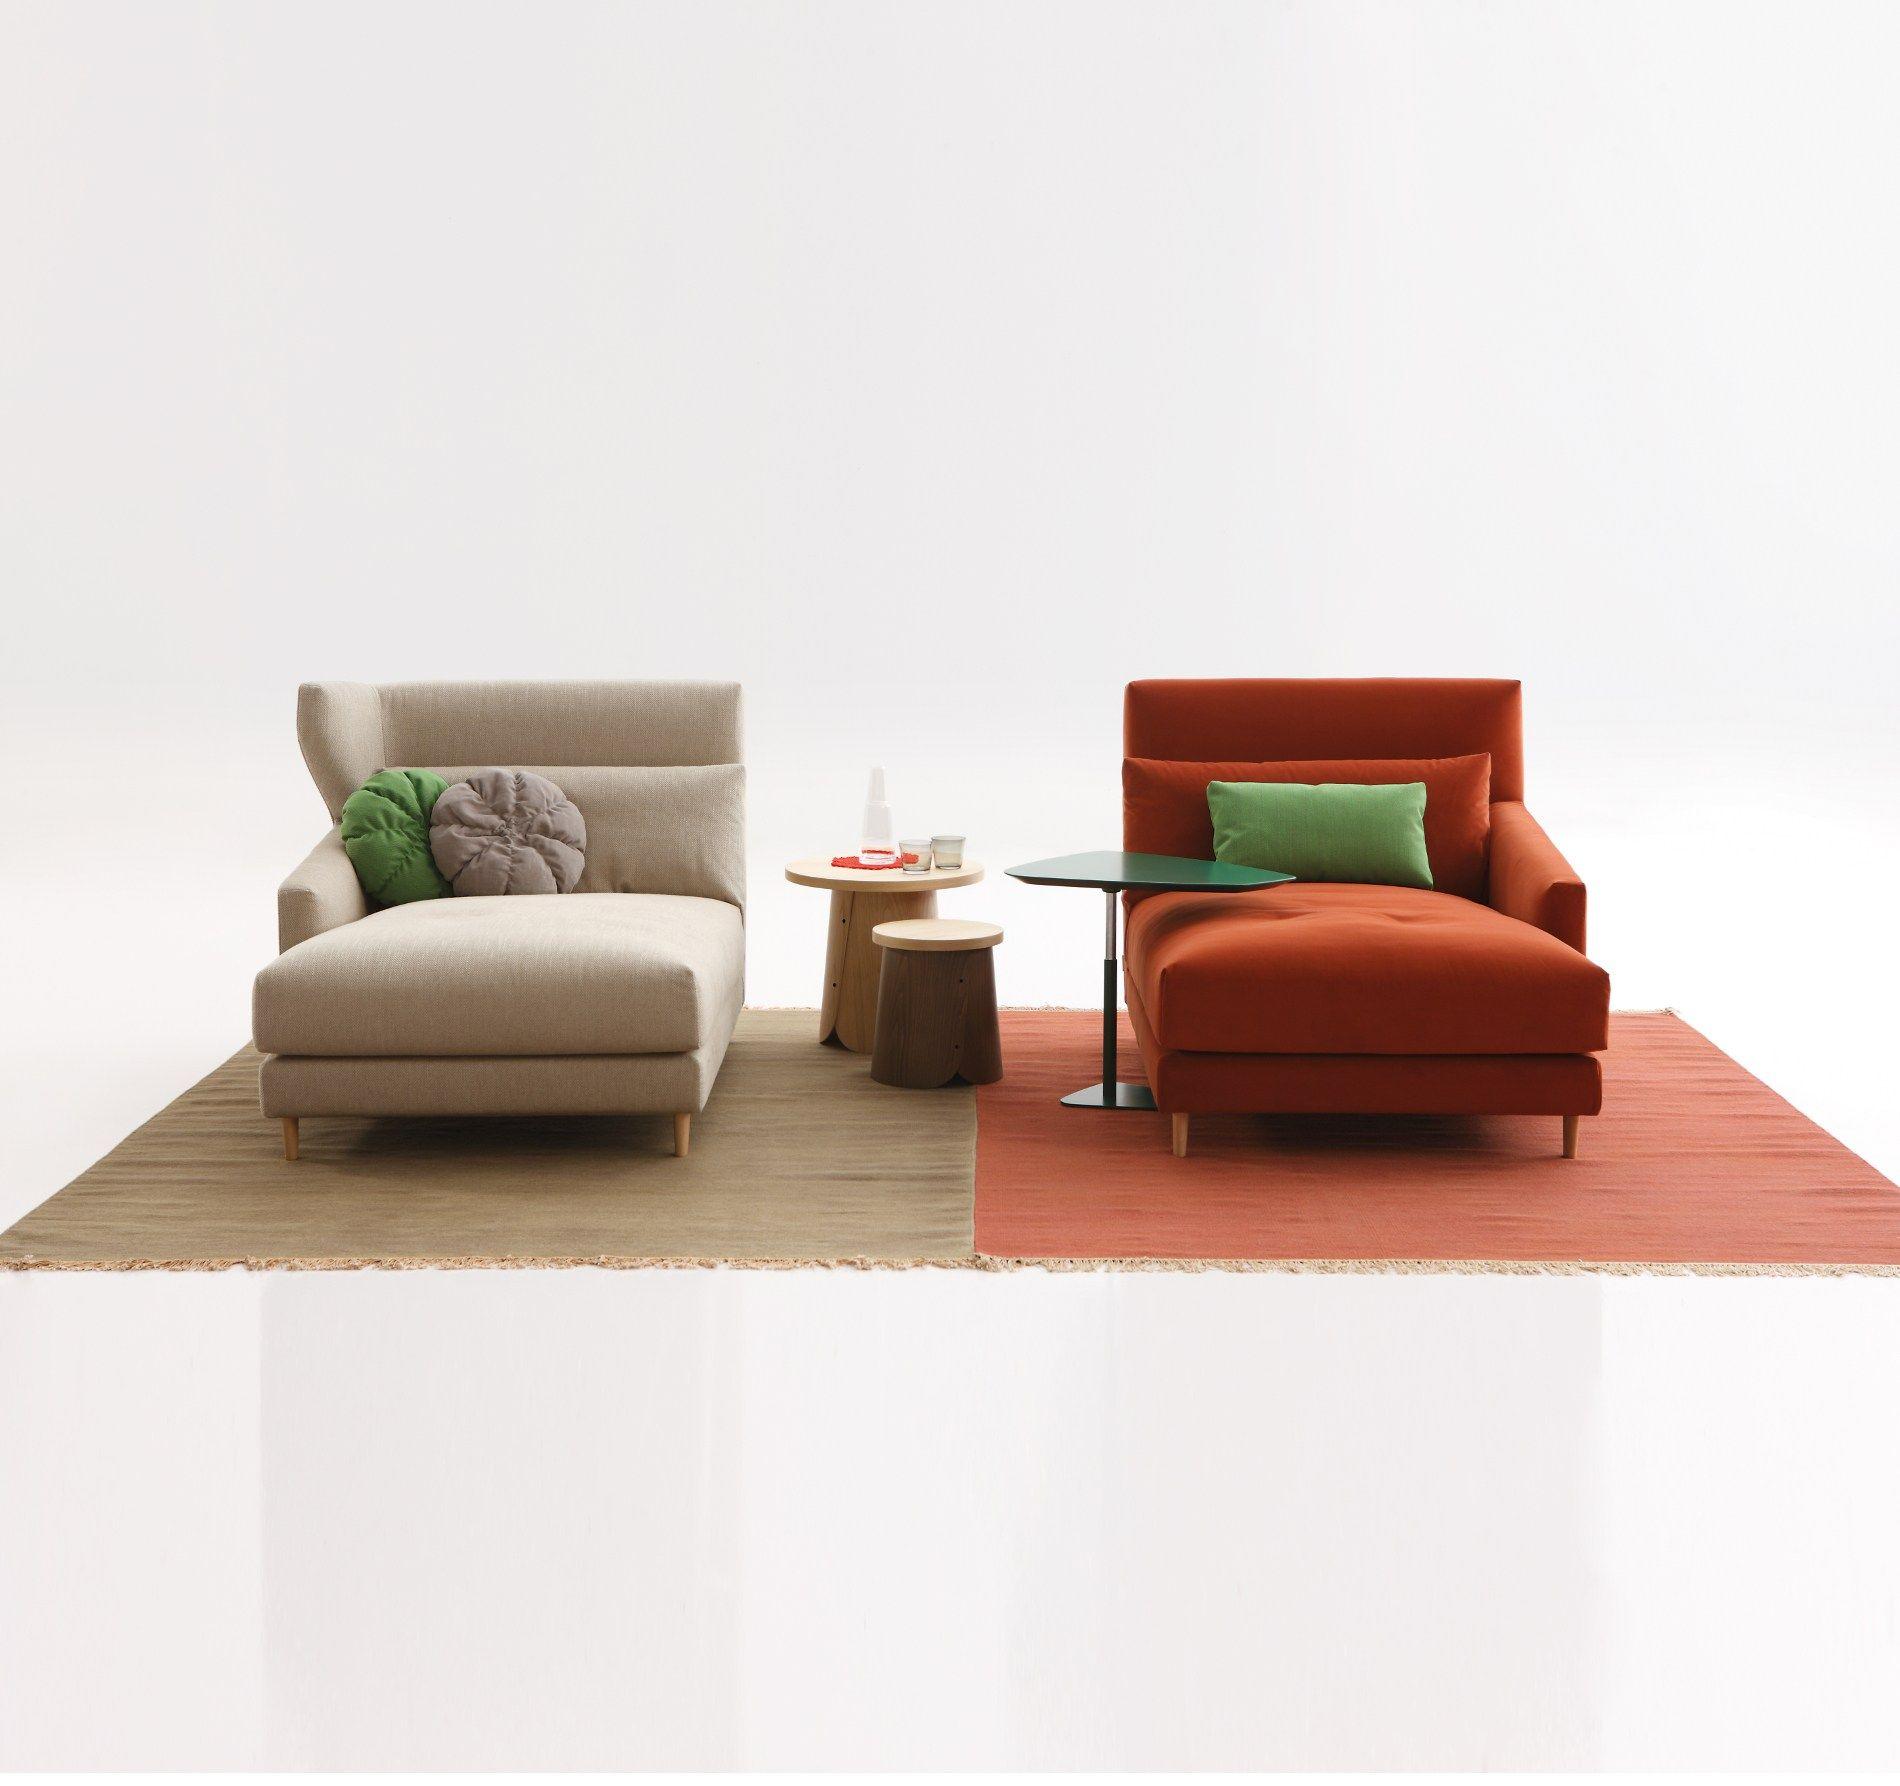 Folk armchair by sancal design rafa garc a - Sancal folk ...